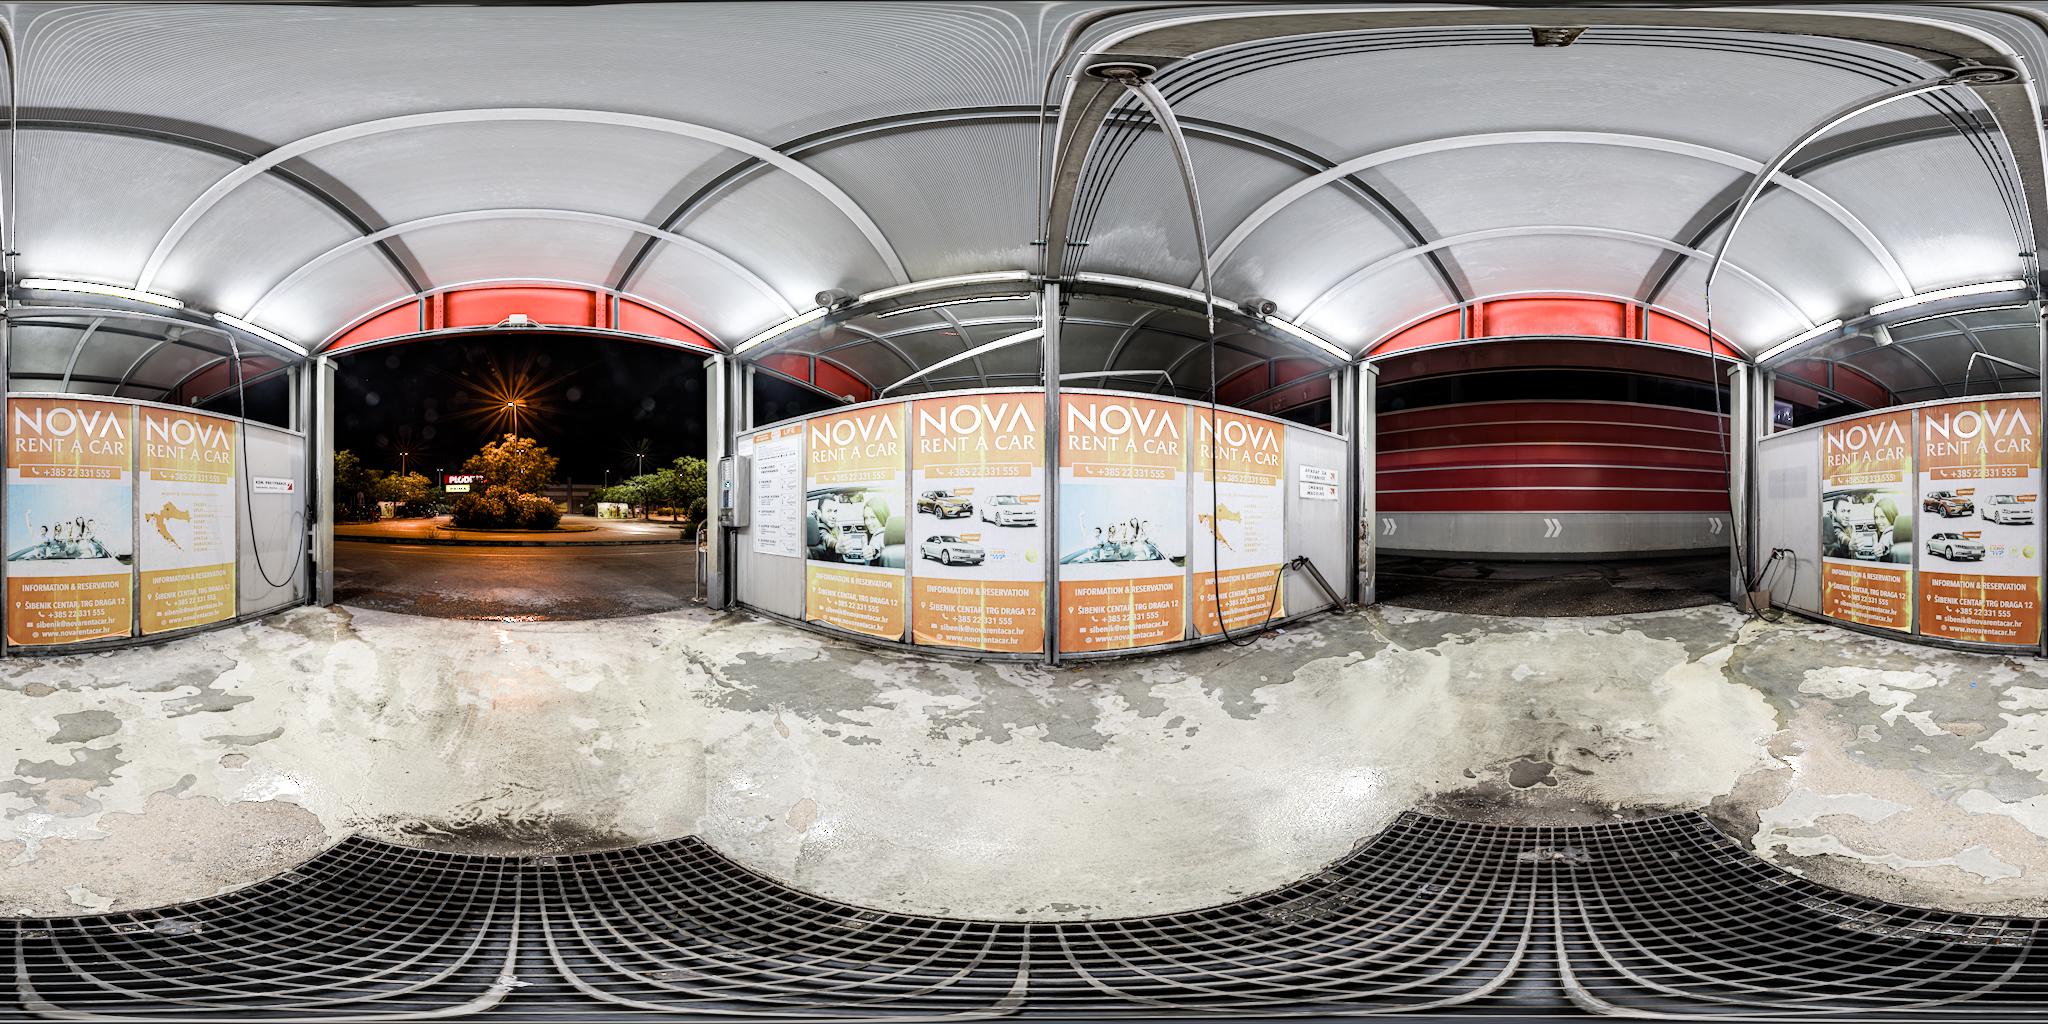 HDRI-Skies-Car-Wash-Šibenik